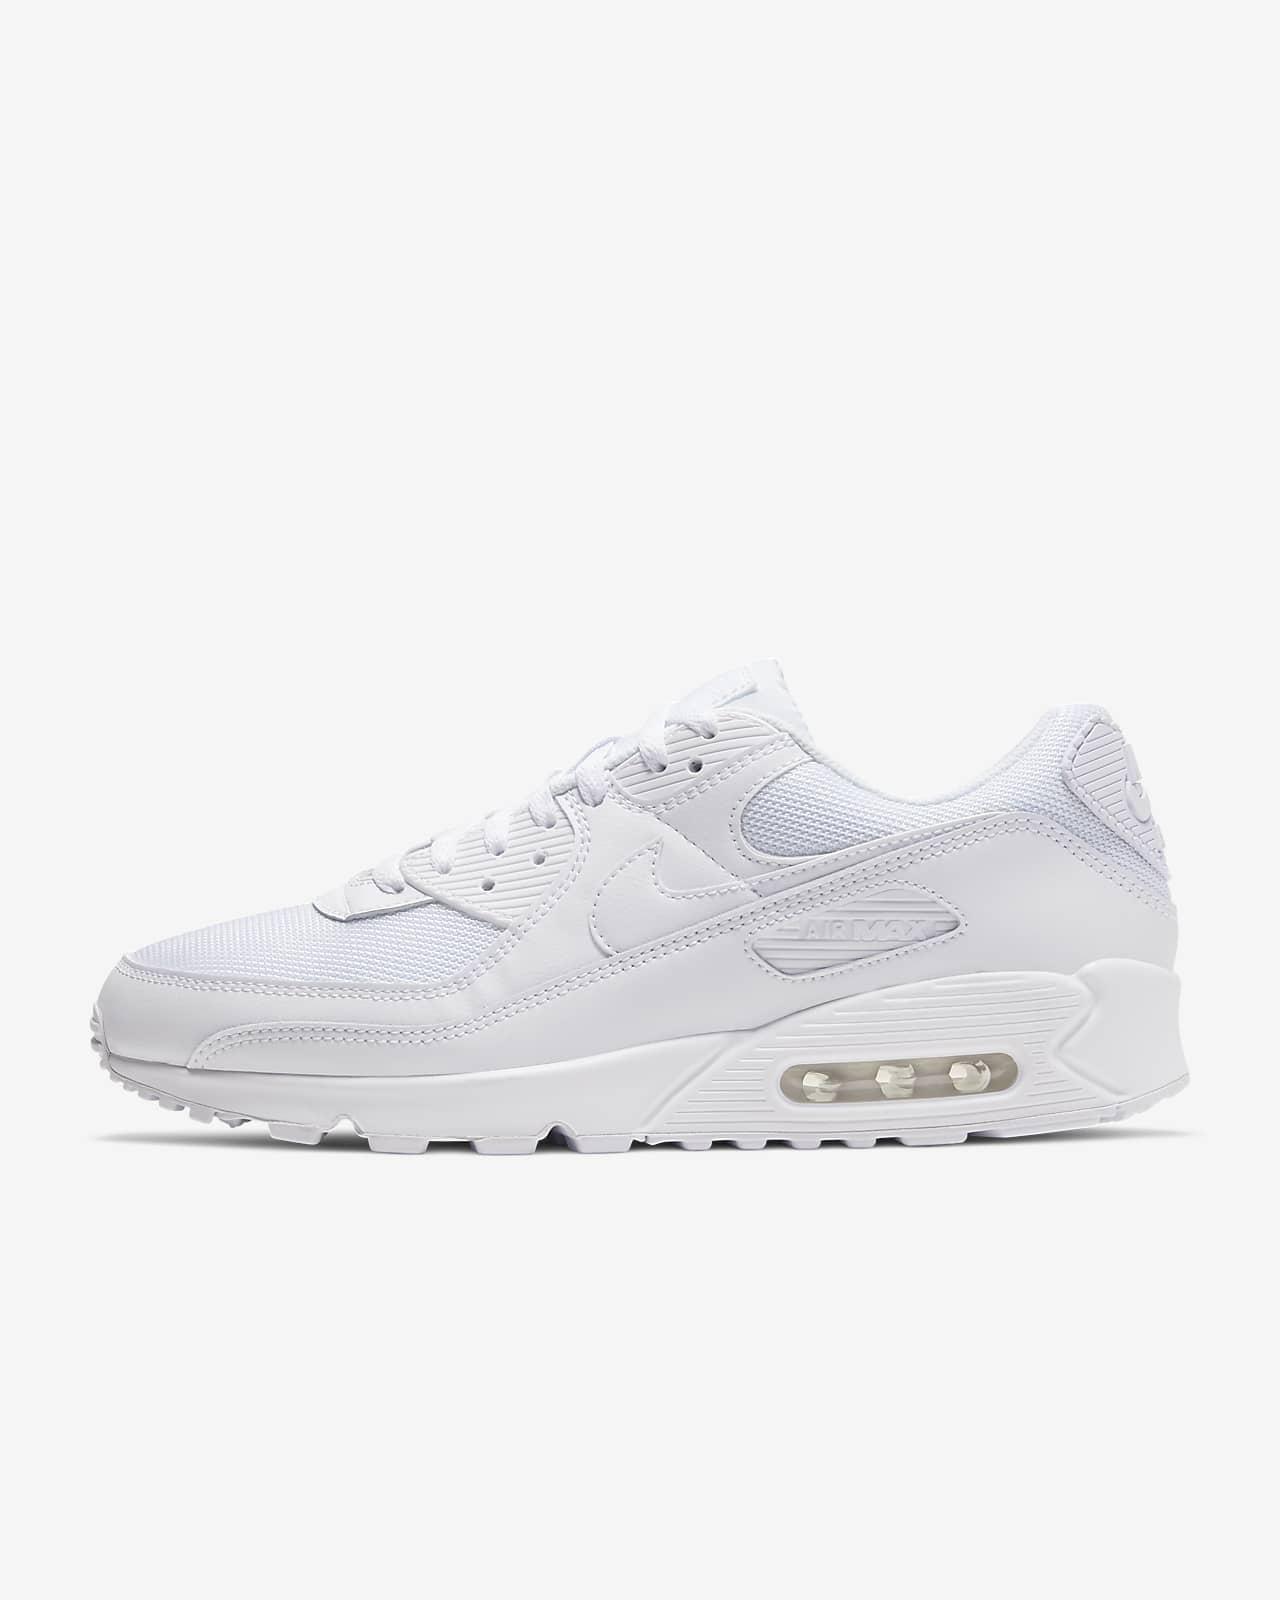 chaussures nike air max blanche